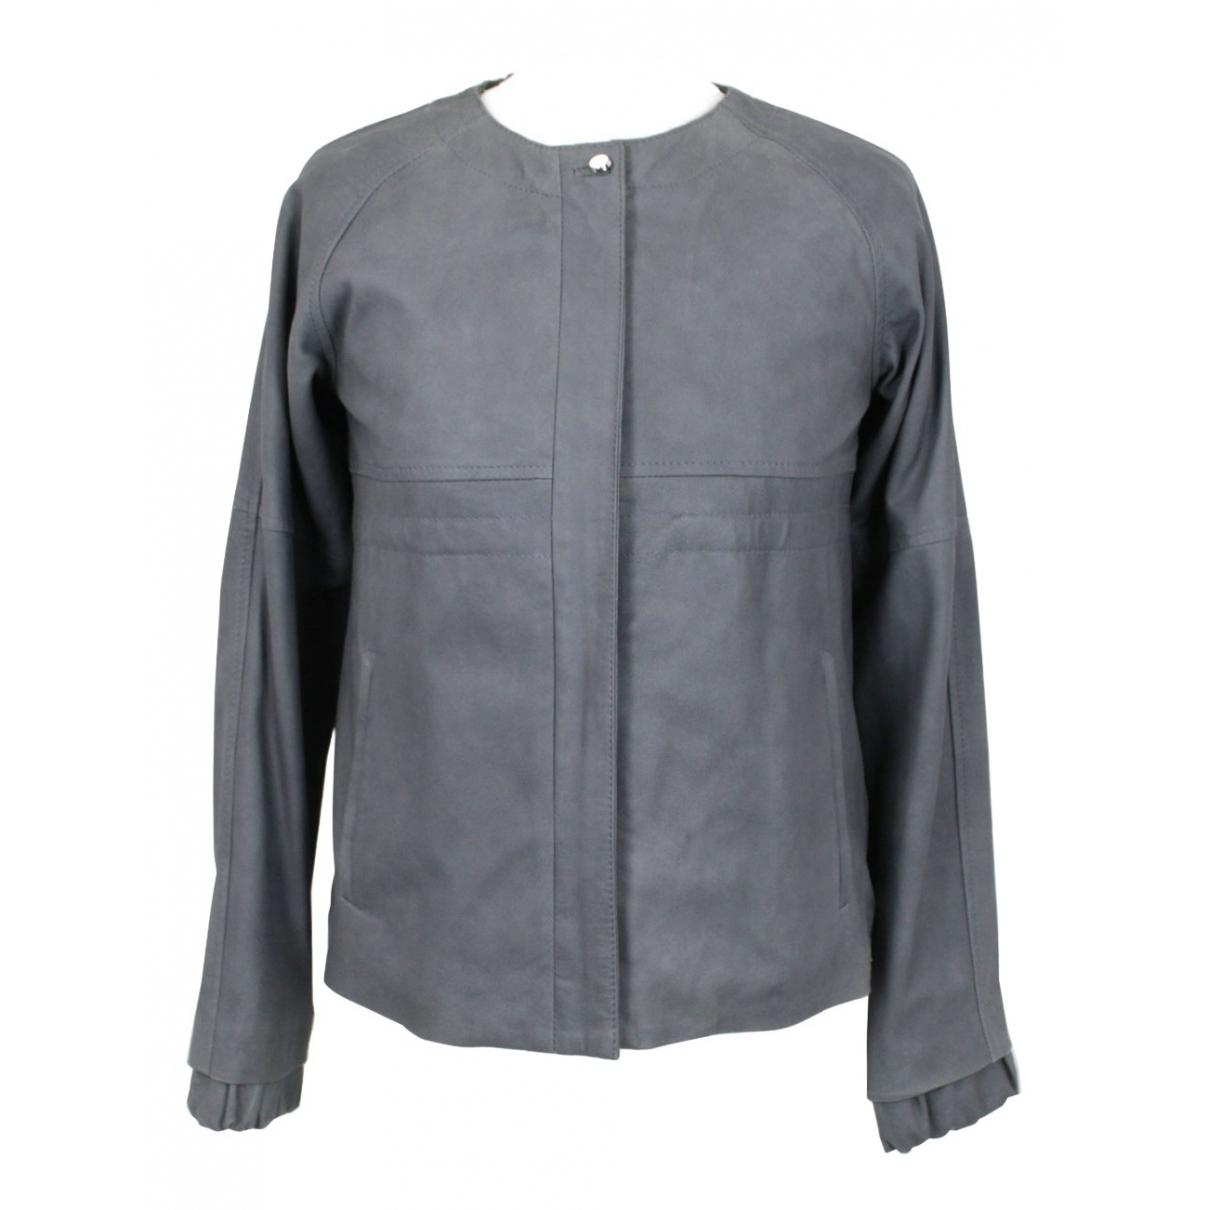 Chloé N Grey Leather jacket for Women S International